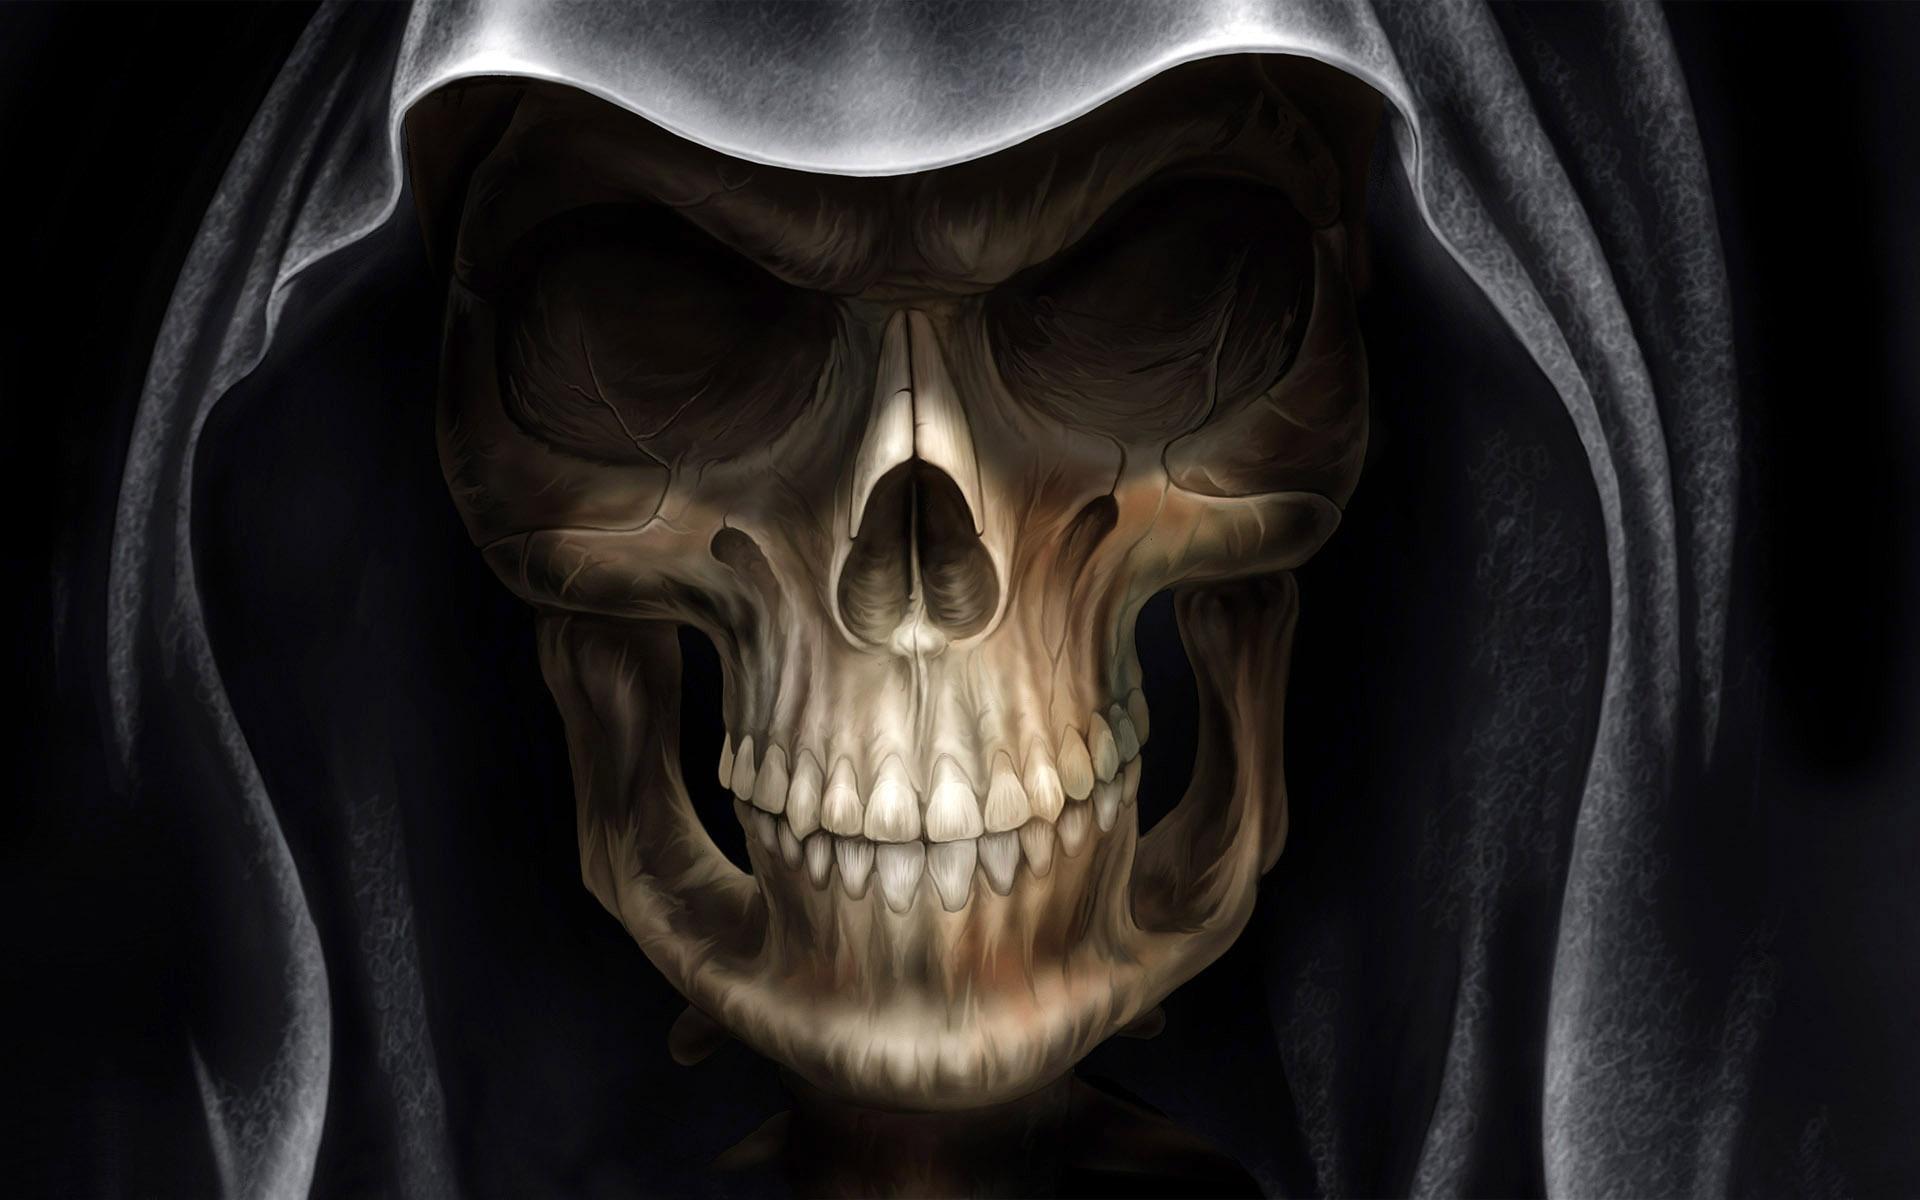 Demon Alien Devil Skull Wallpapers In Jpg Format For Free Download